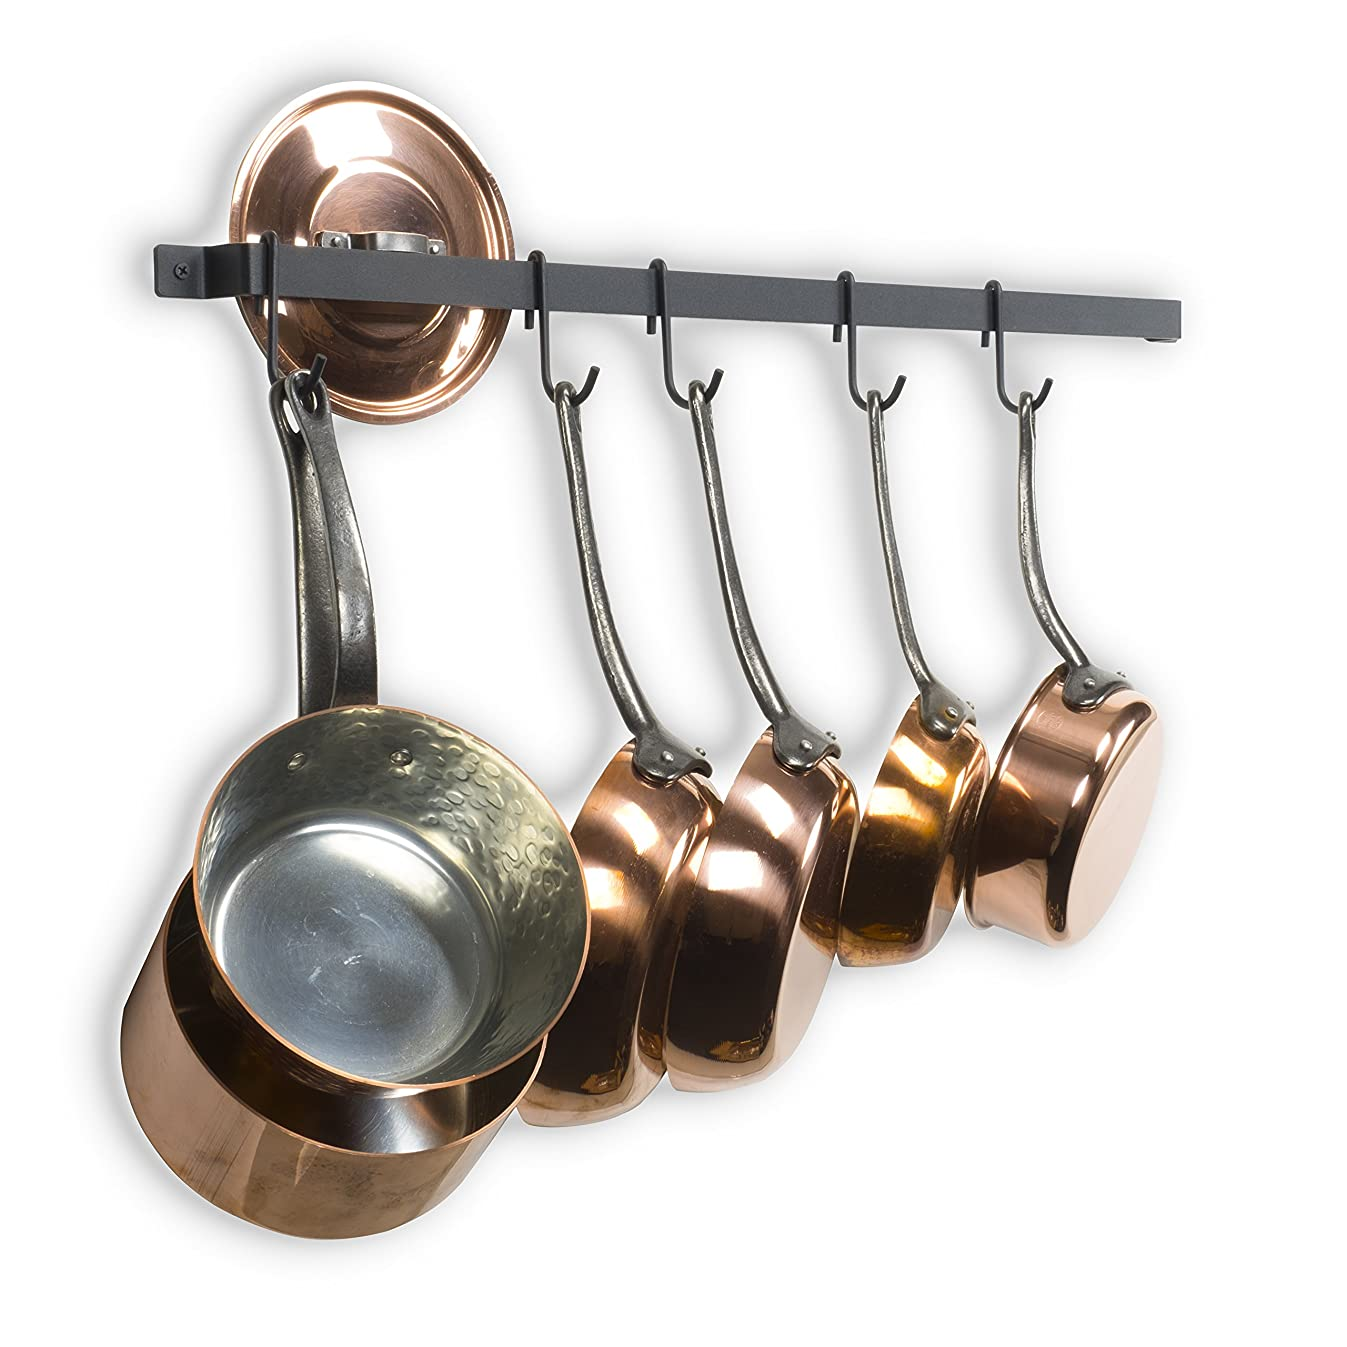 Wallniture Kitchen Rail Organizer Iron Hanging Utensils Rack with Hooks Frosty Black 30 Inch